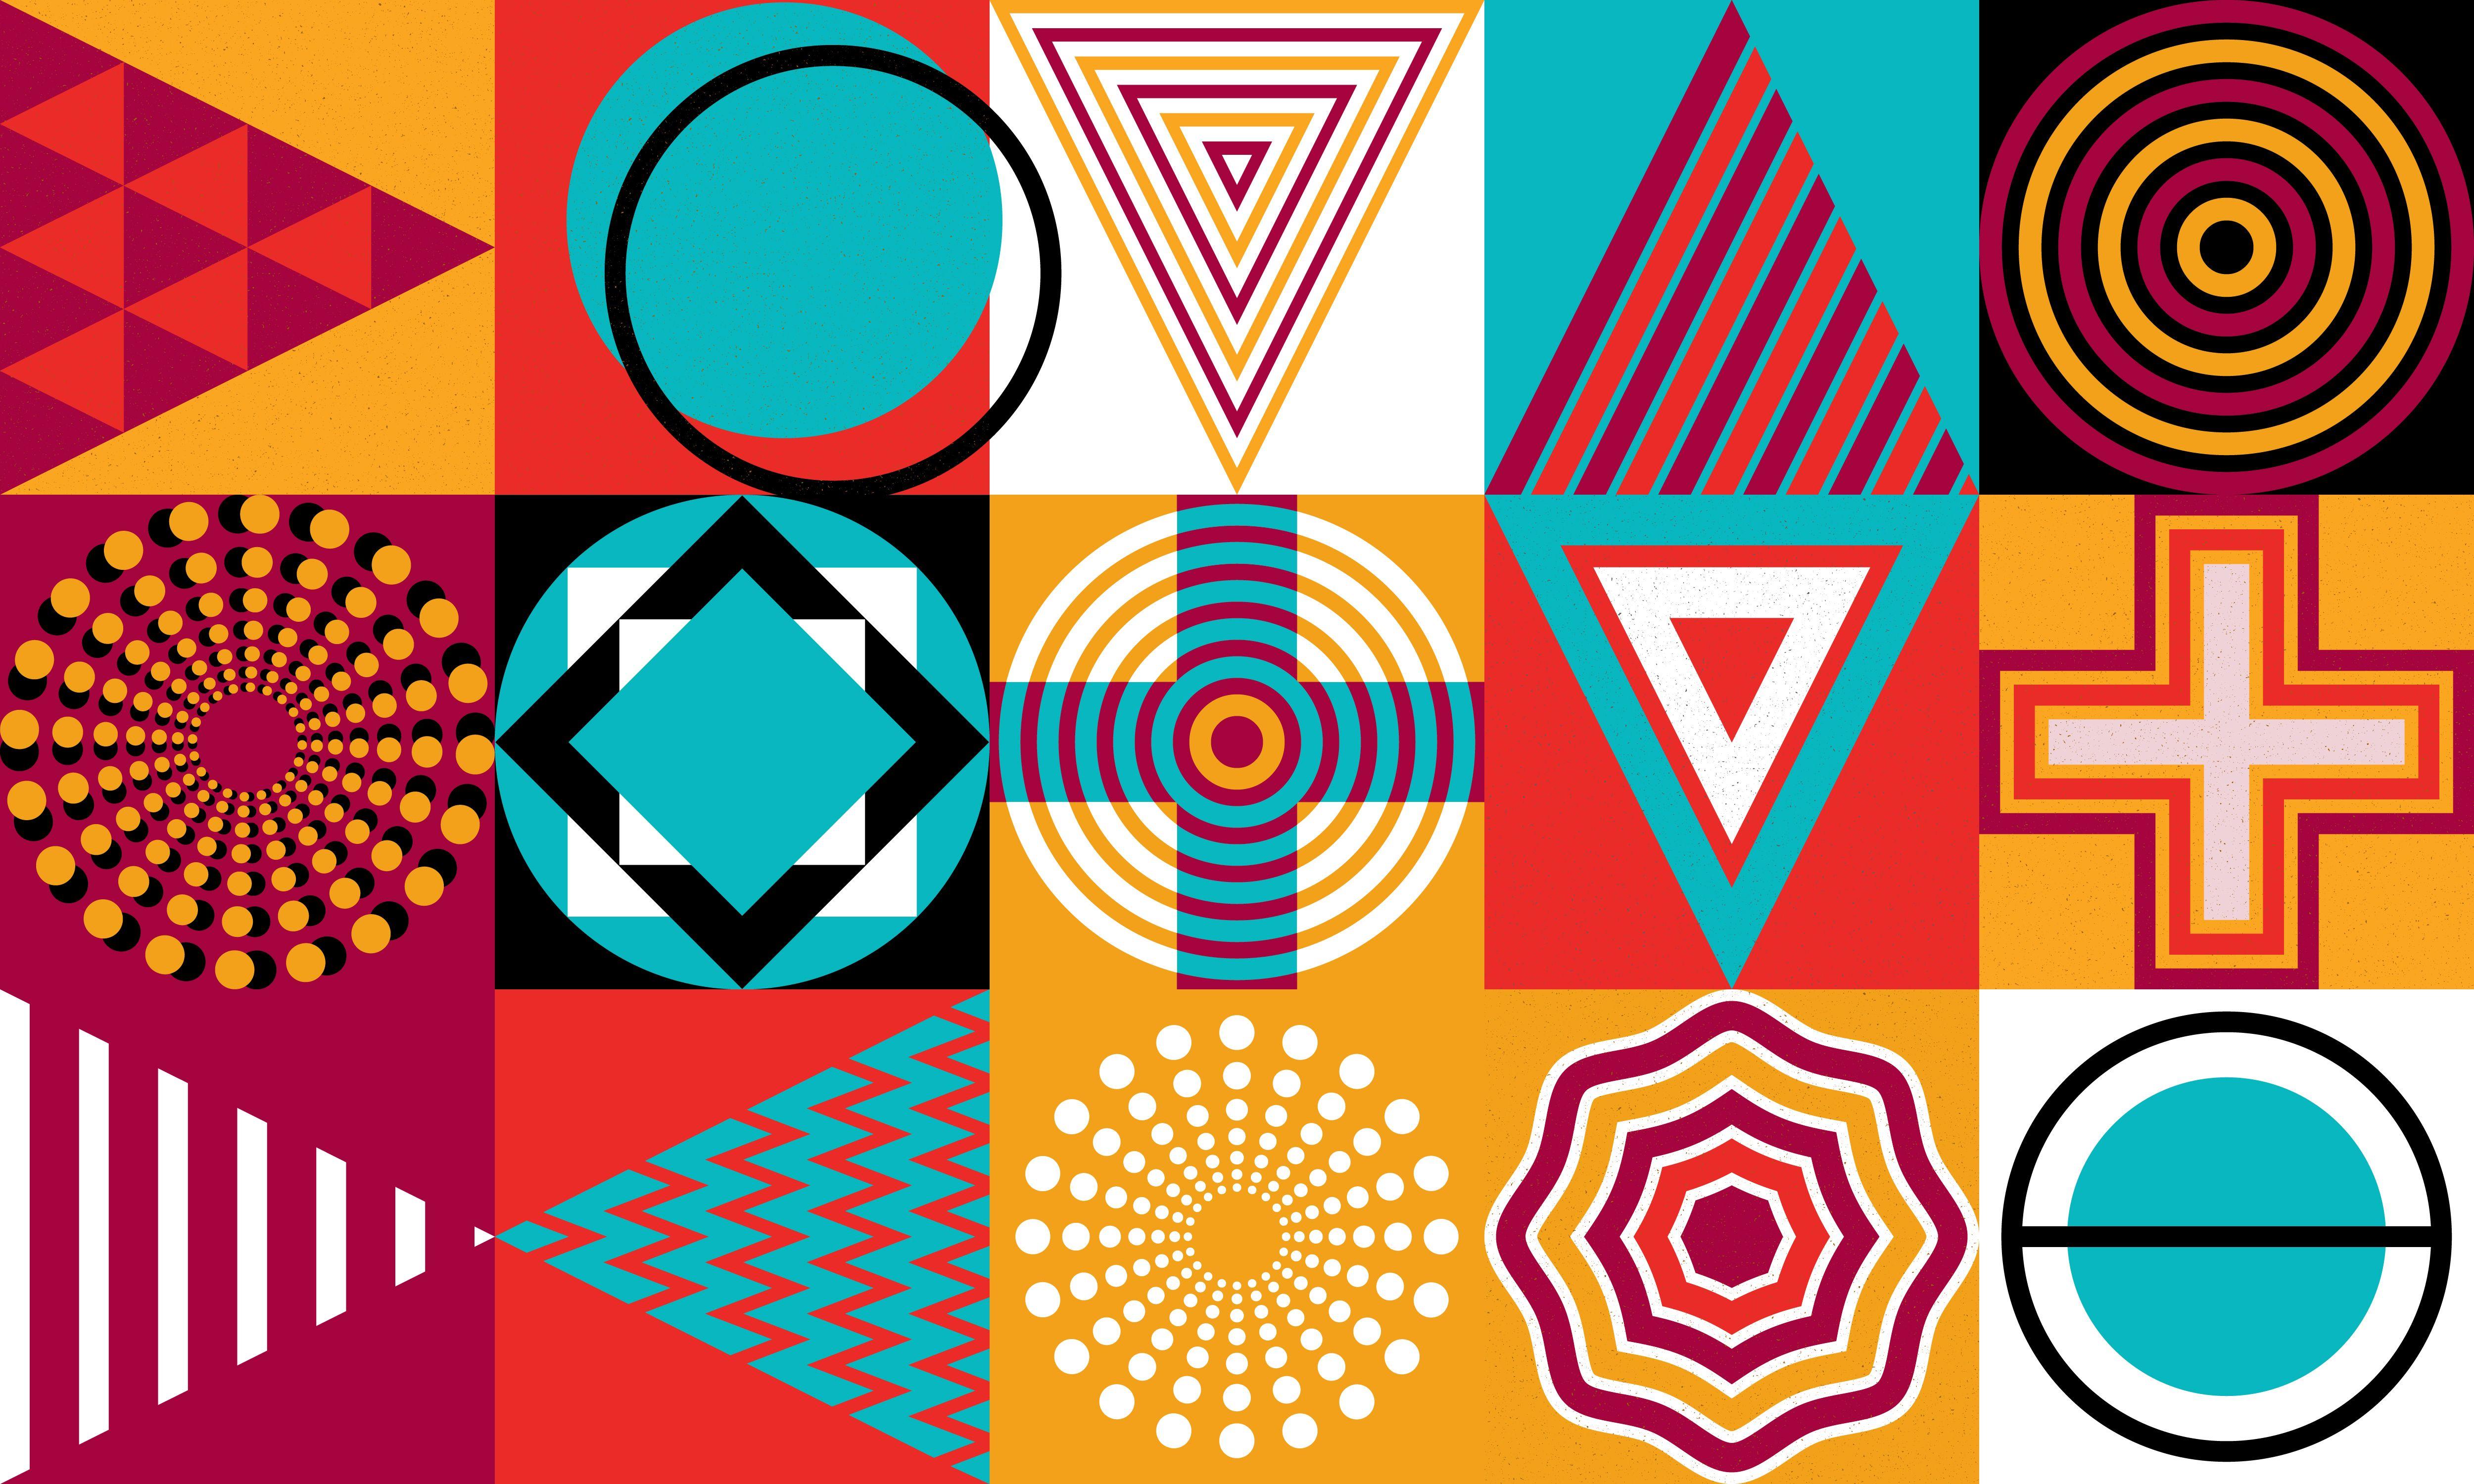 #surfacepattern #fabricdesign #textiledesign #patternprint #geometry #generative #inspiration #leaf